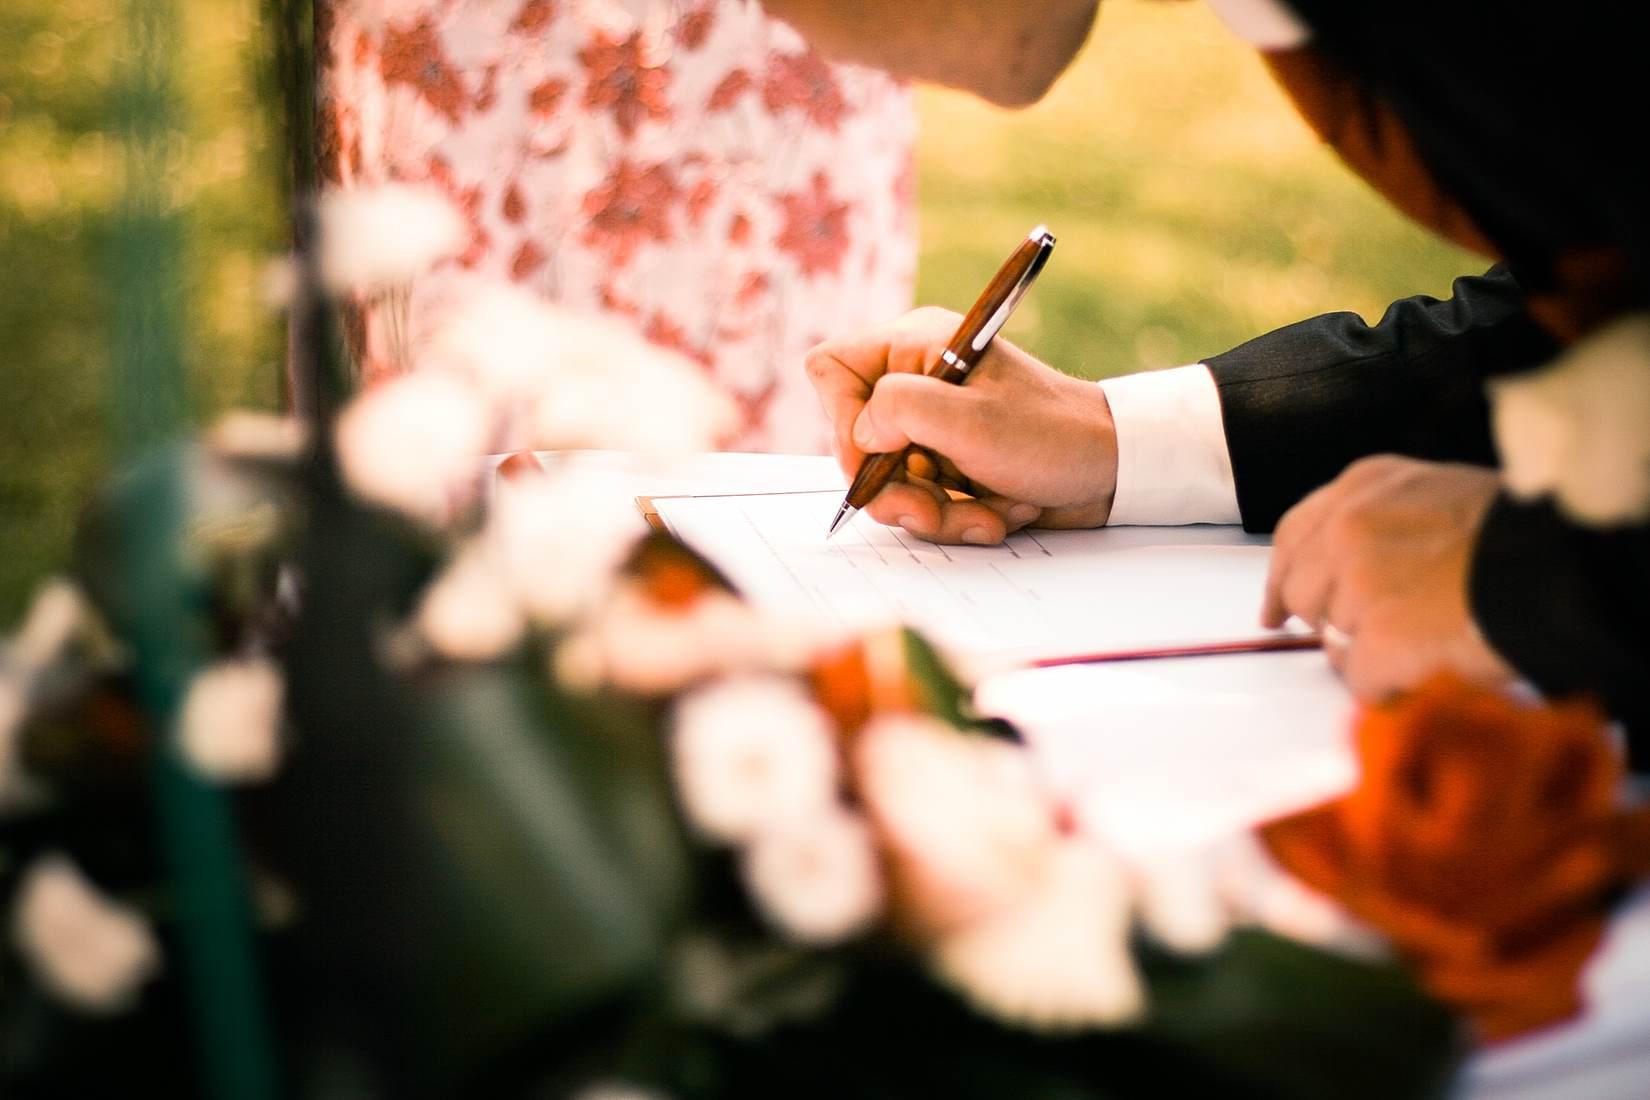 Wedding Fair at Rosspark Hotel in Ballymena